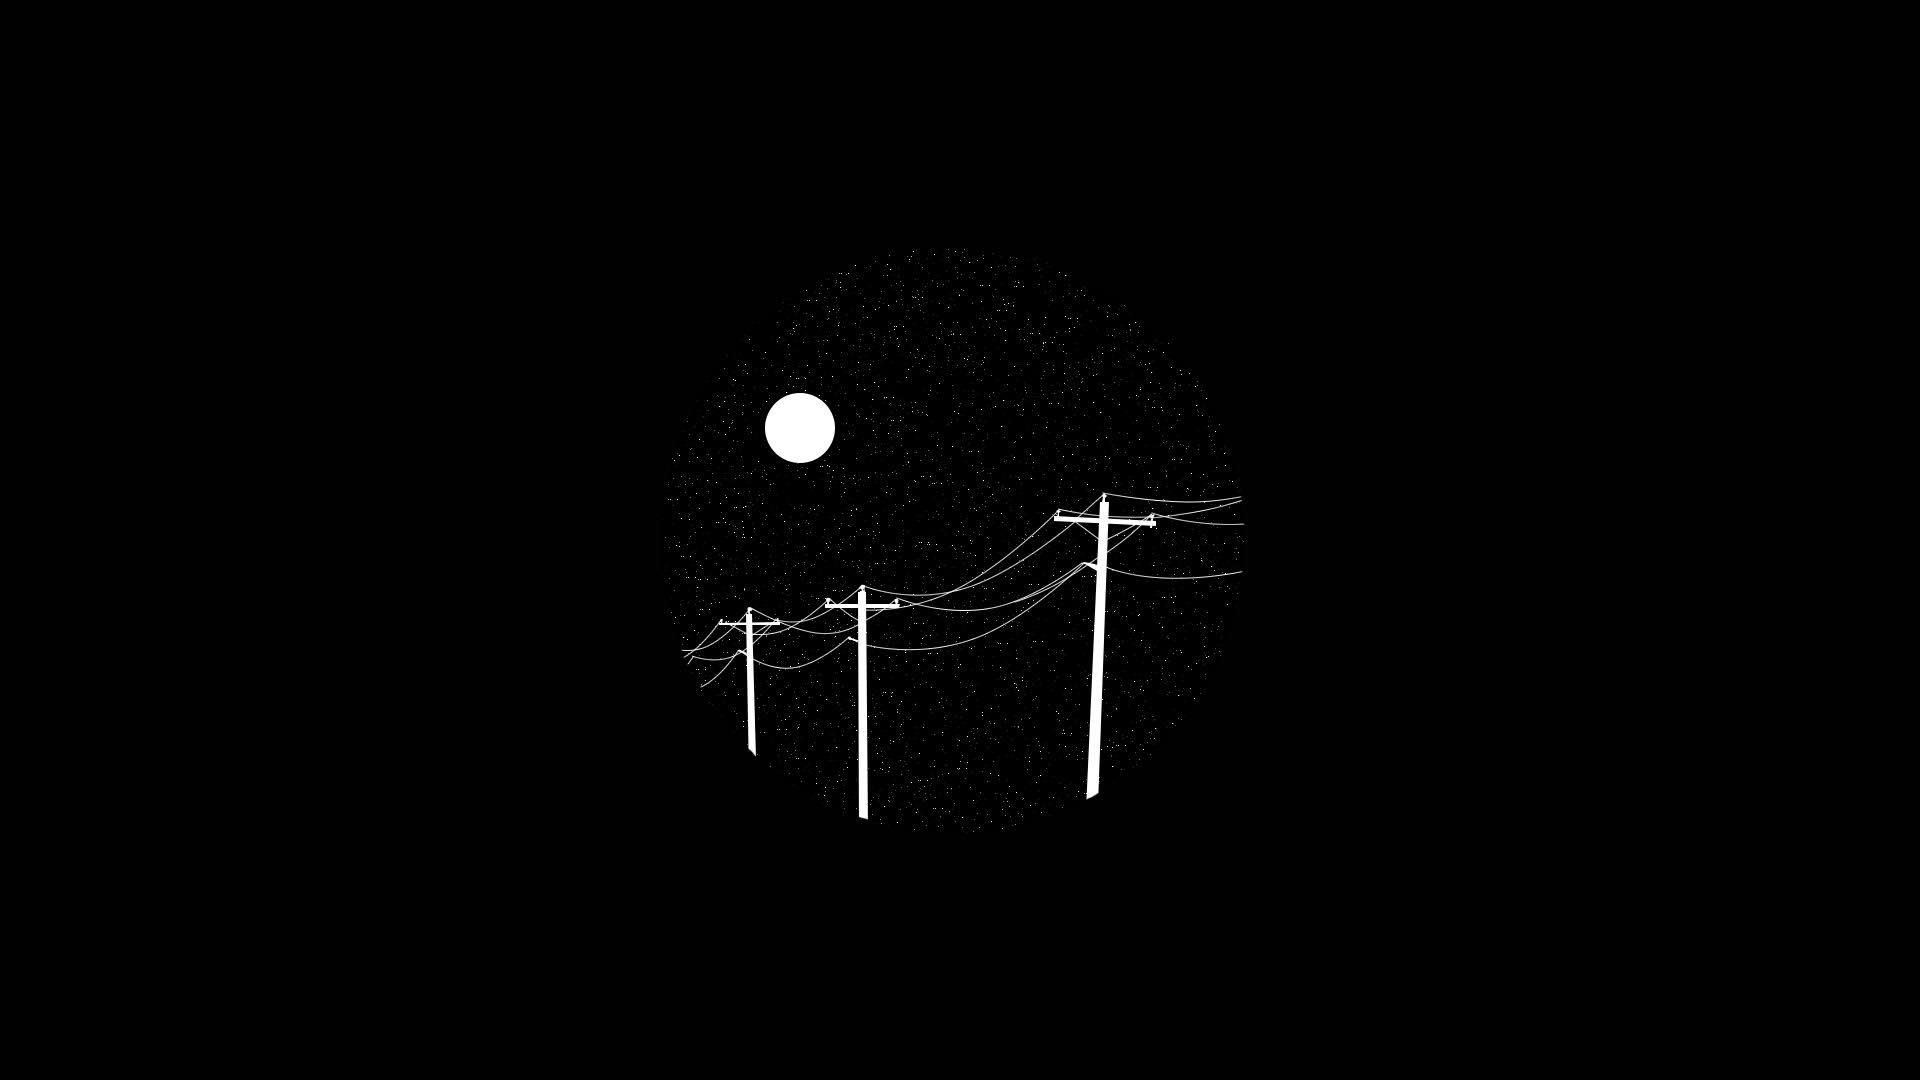 Wallpaper Black Simple Minimalism White Sky Dark Night Stars Circle Moon 1920x1080 Worf359 1828723 Hd Wallpapers Wallhere